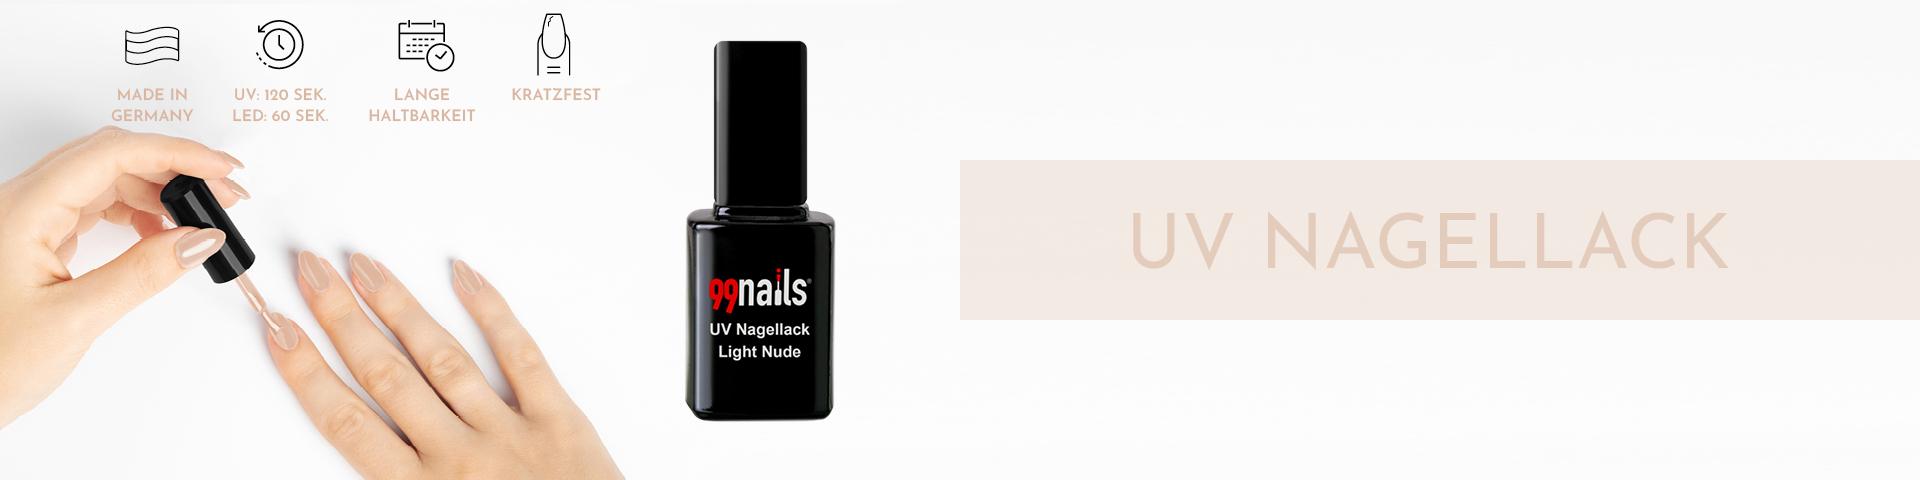 UV Nagellack